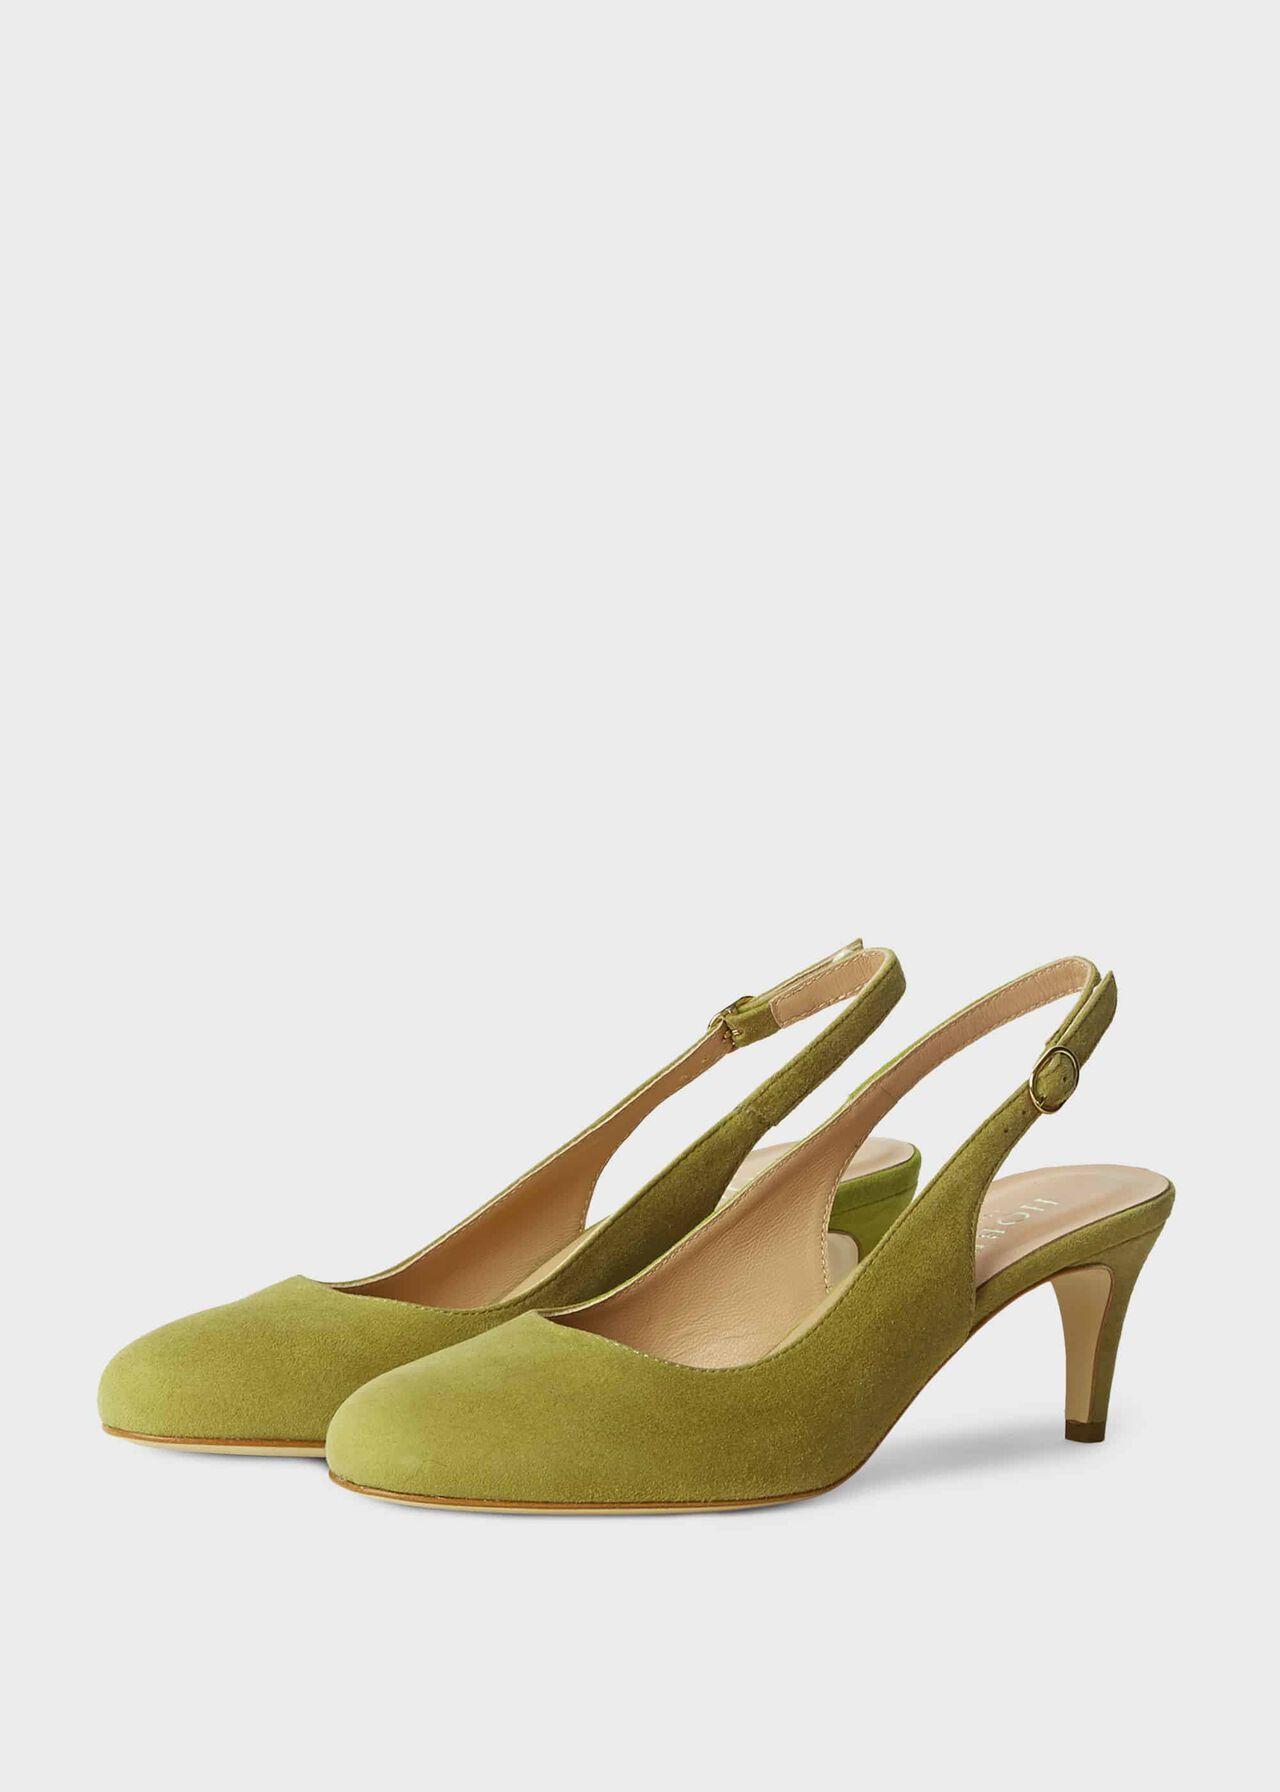 Emma Suede Stiletto Slingback Court Shoes Leaf Green